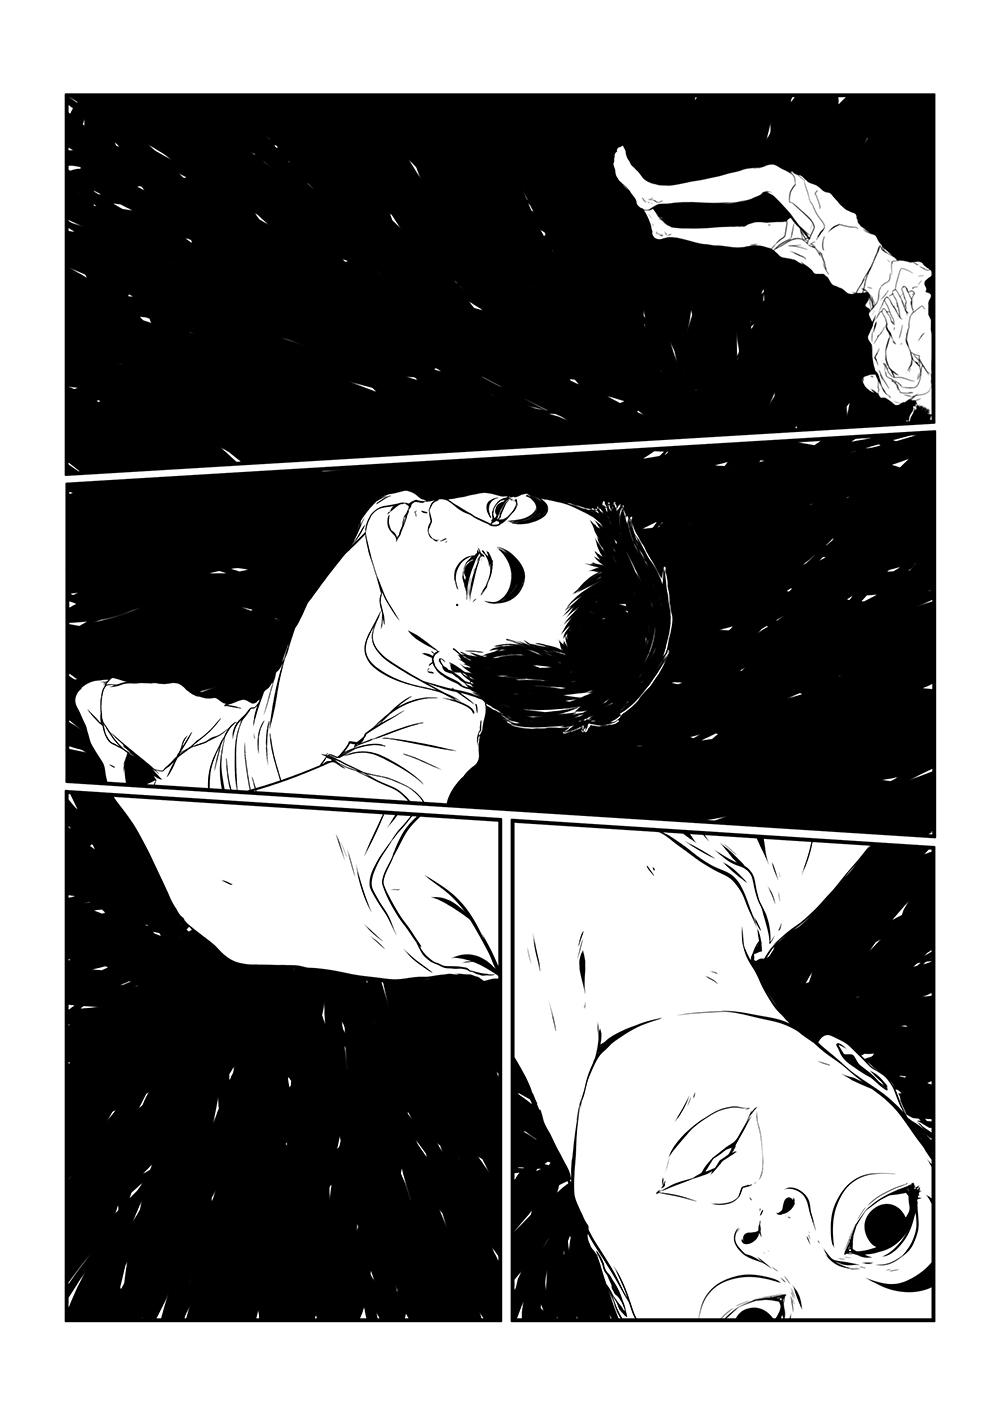 mojowang_illustration_betweenrivers_21_5.jpg